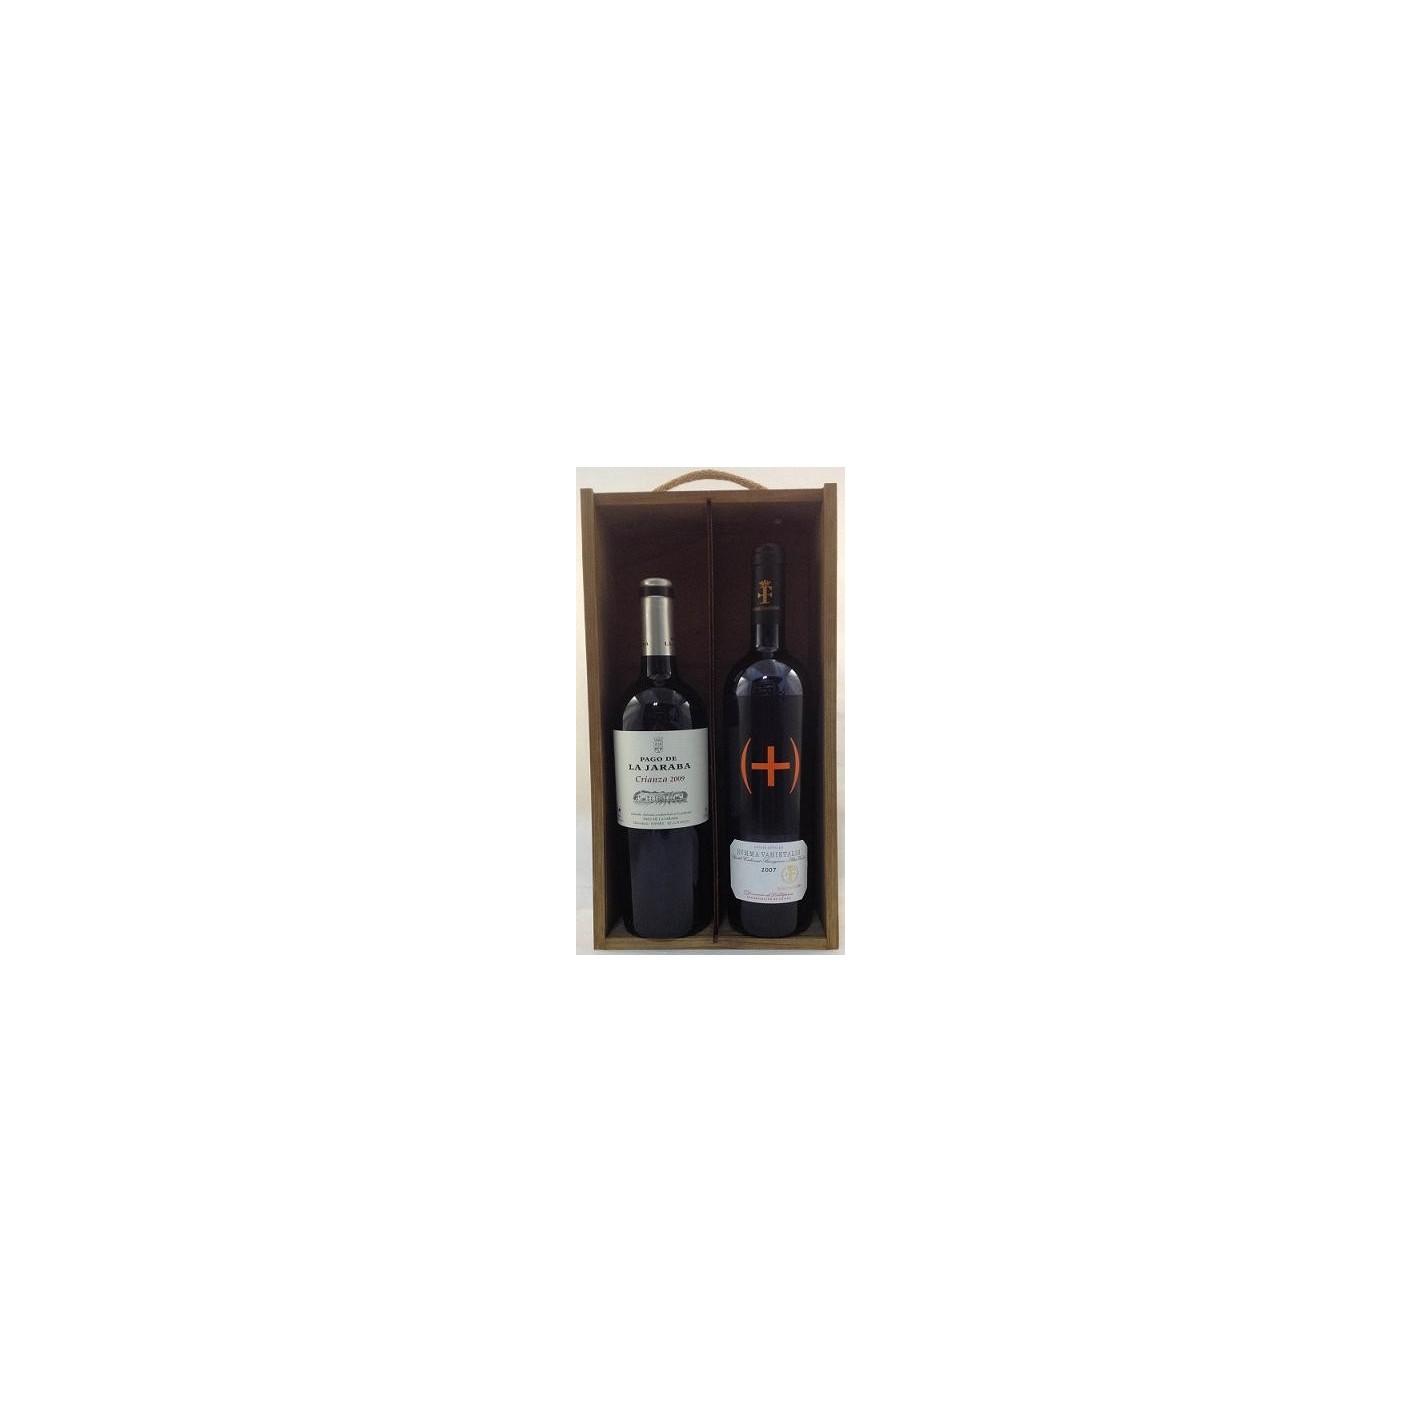 Estuche de vino 2 botellas mancha 4 surtido - Manchas de vino ...